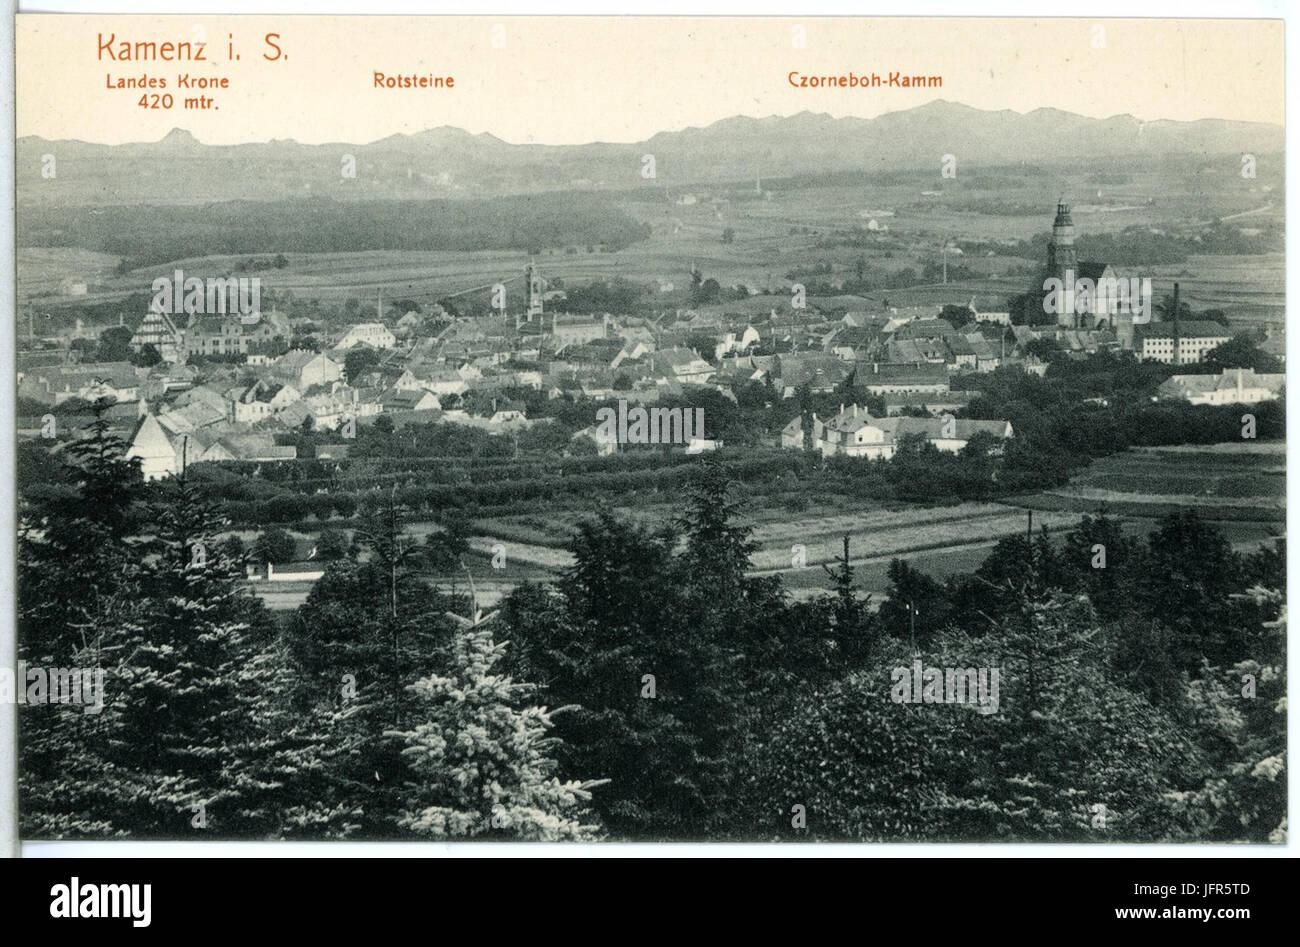 14948-Kamenz-1912-Blick auf Kamenz-Brück & Sohn Kunstverlag - Stock Image